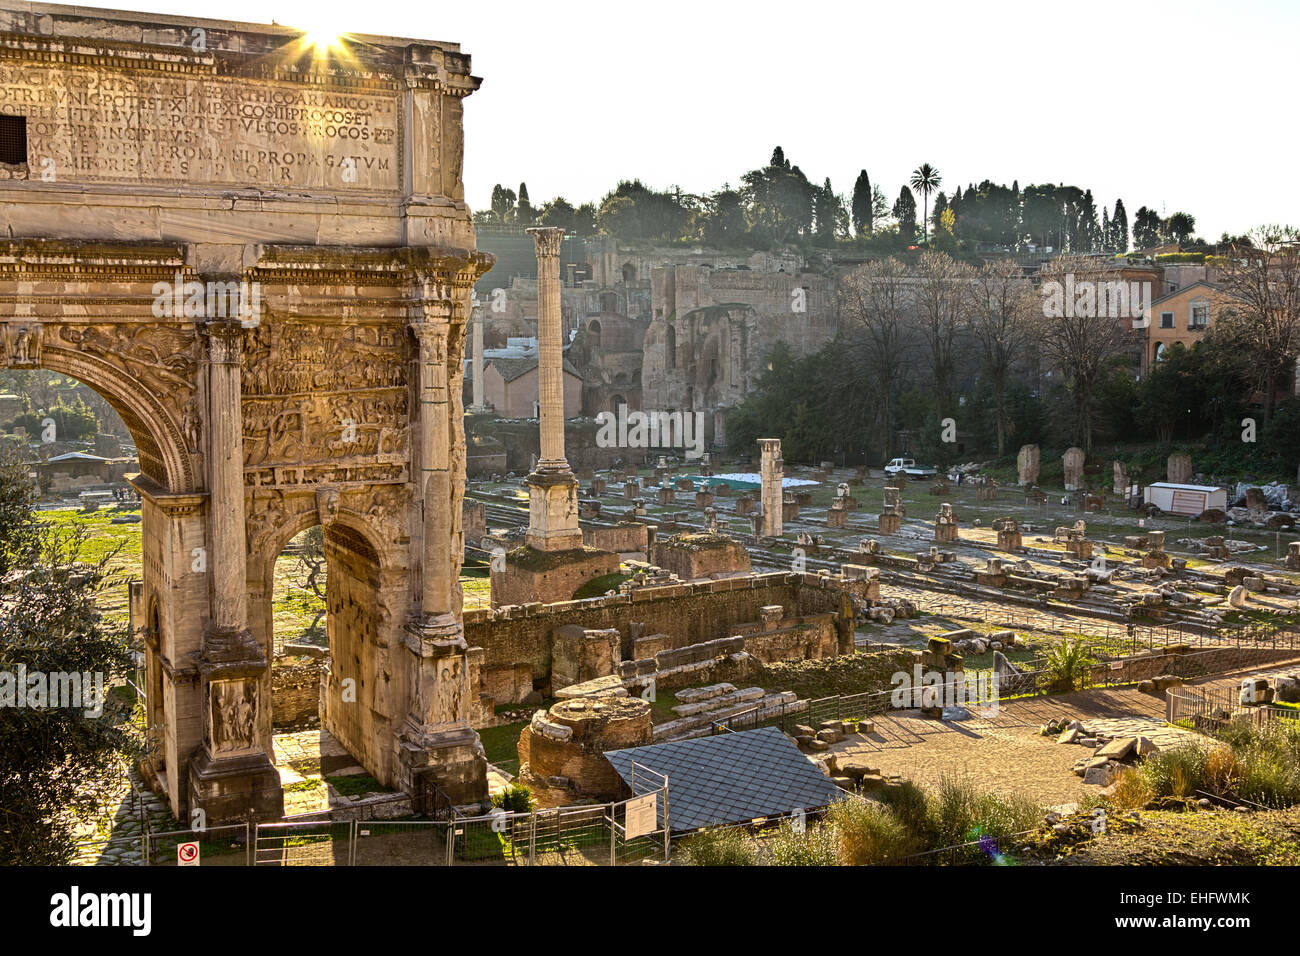 Ancient Rome Ruins - Stock Image